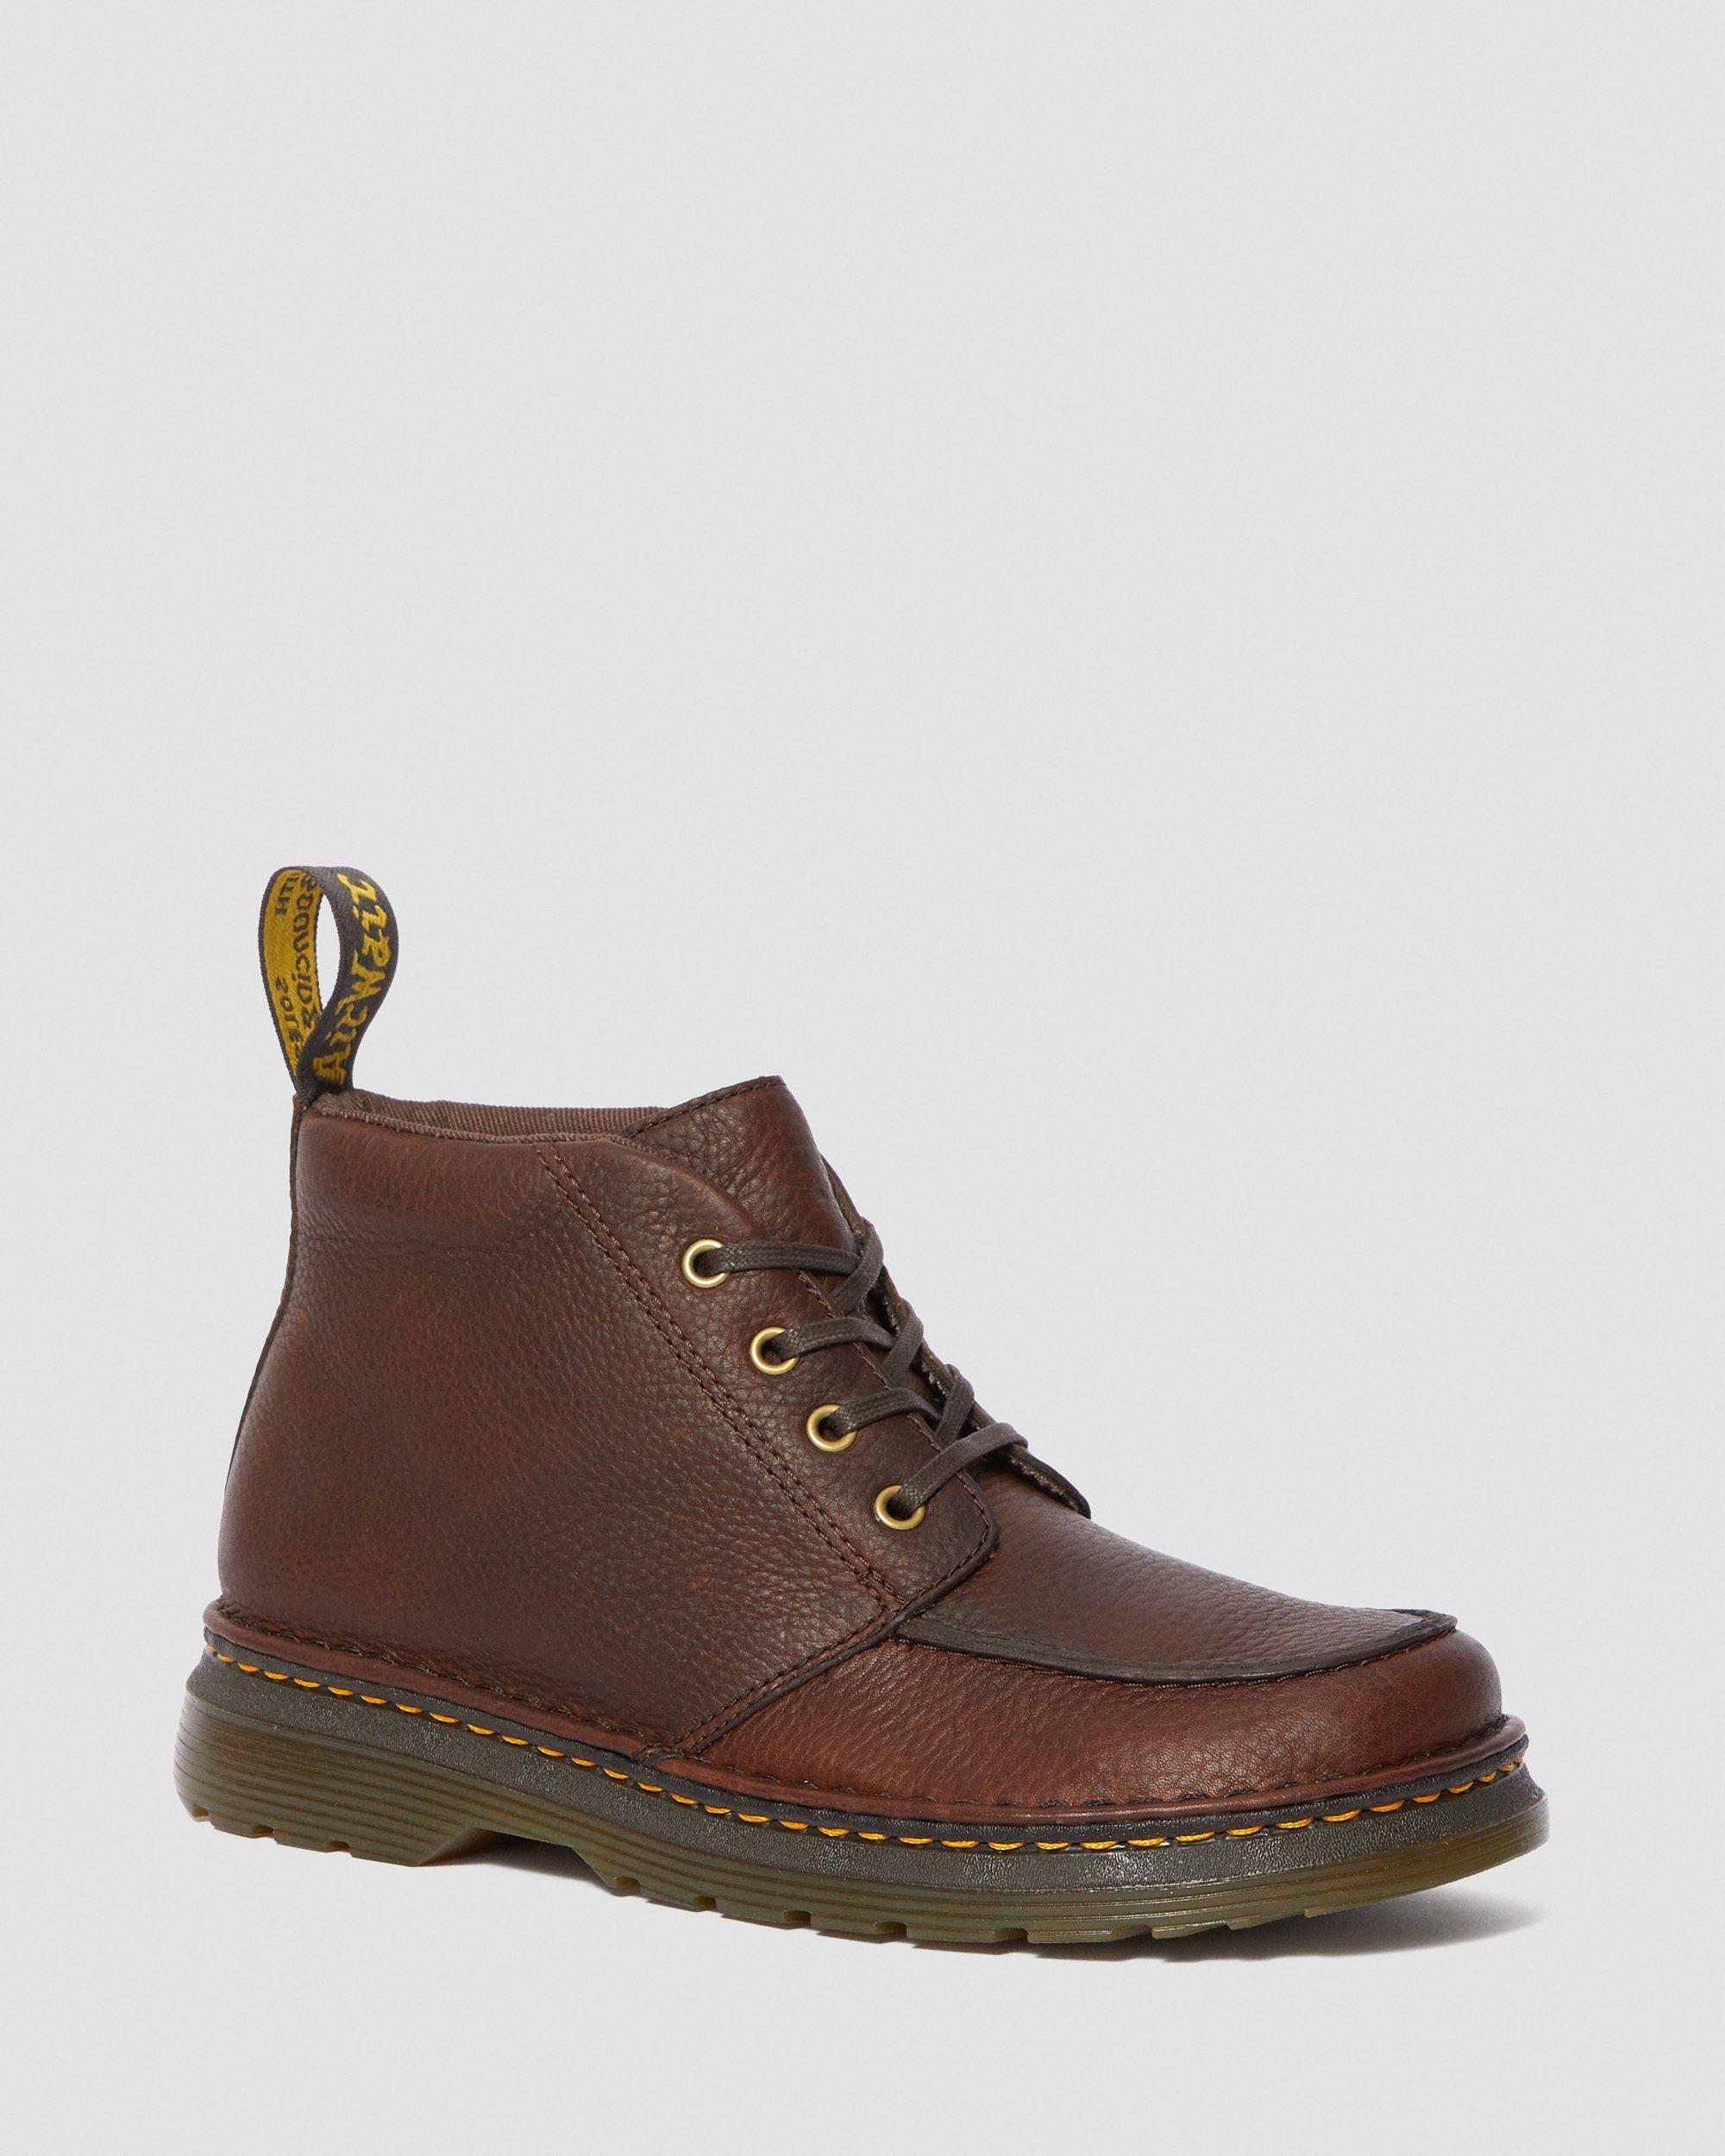 Dr Martens Austin Lace Up Chukka Boots